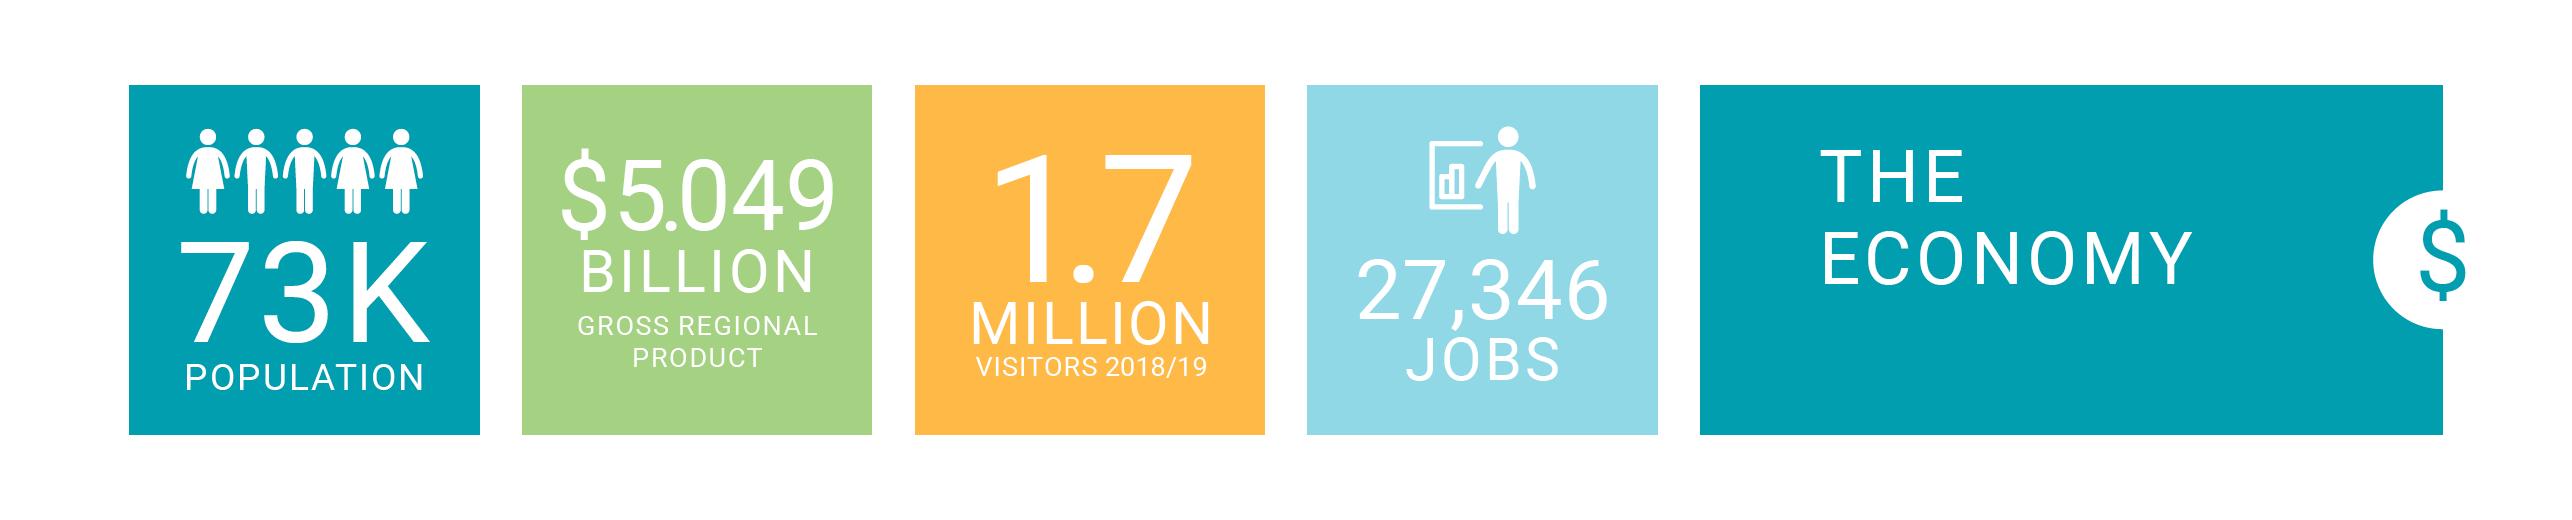 Port Stephens economy snapshot - 73,000 population, $5.049 billion gross regional product, 1.7 million visitors, 27,346 jobs.